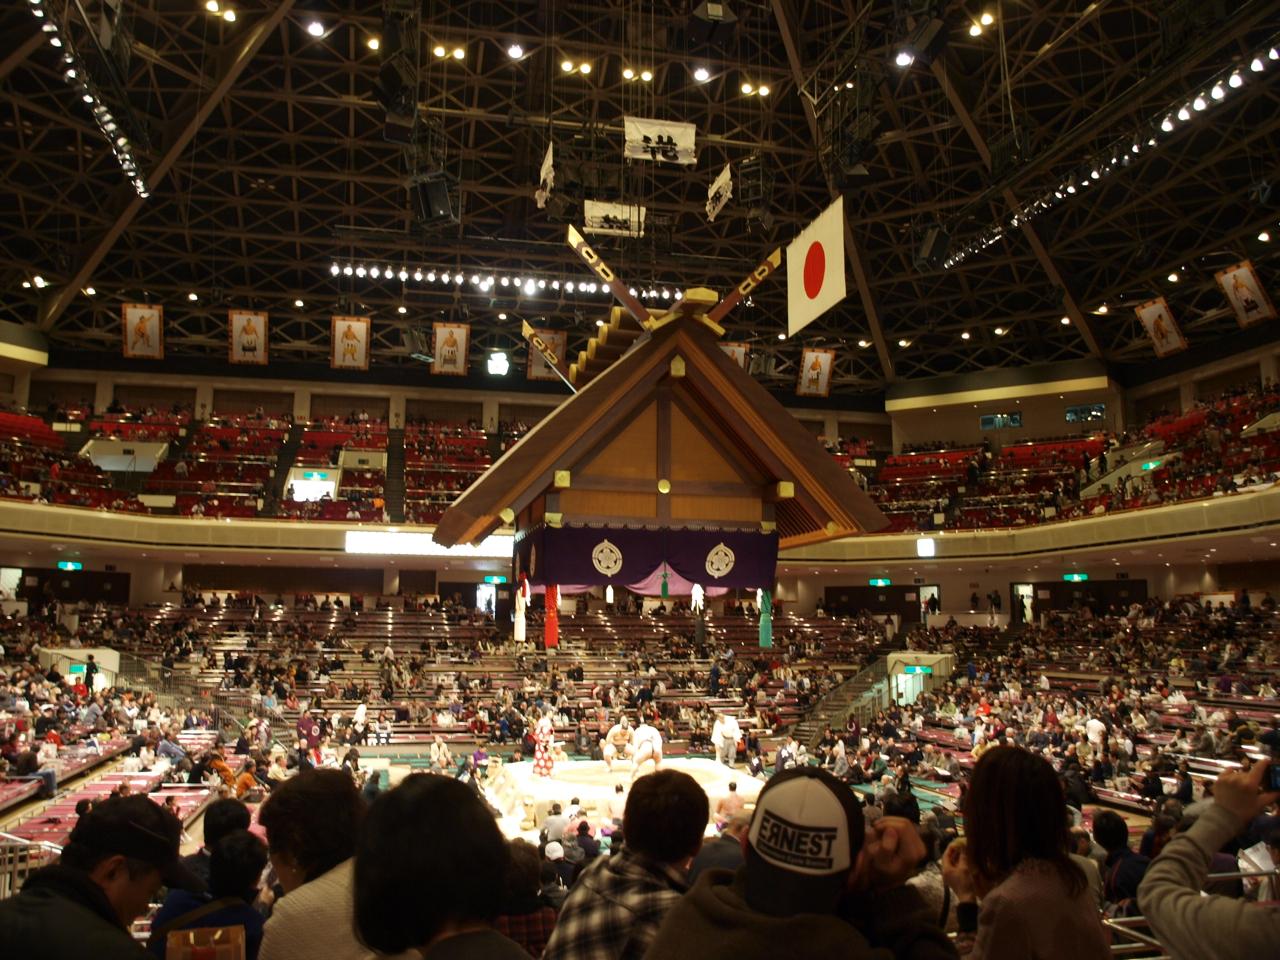 旧式河童堂歳々ブログ: 大相撲初場所見物